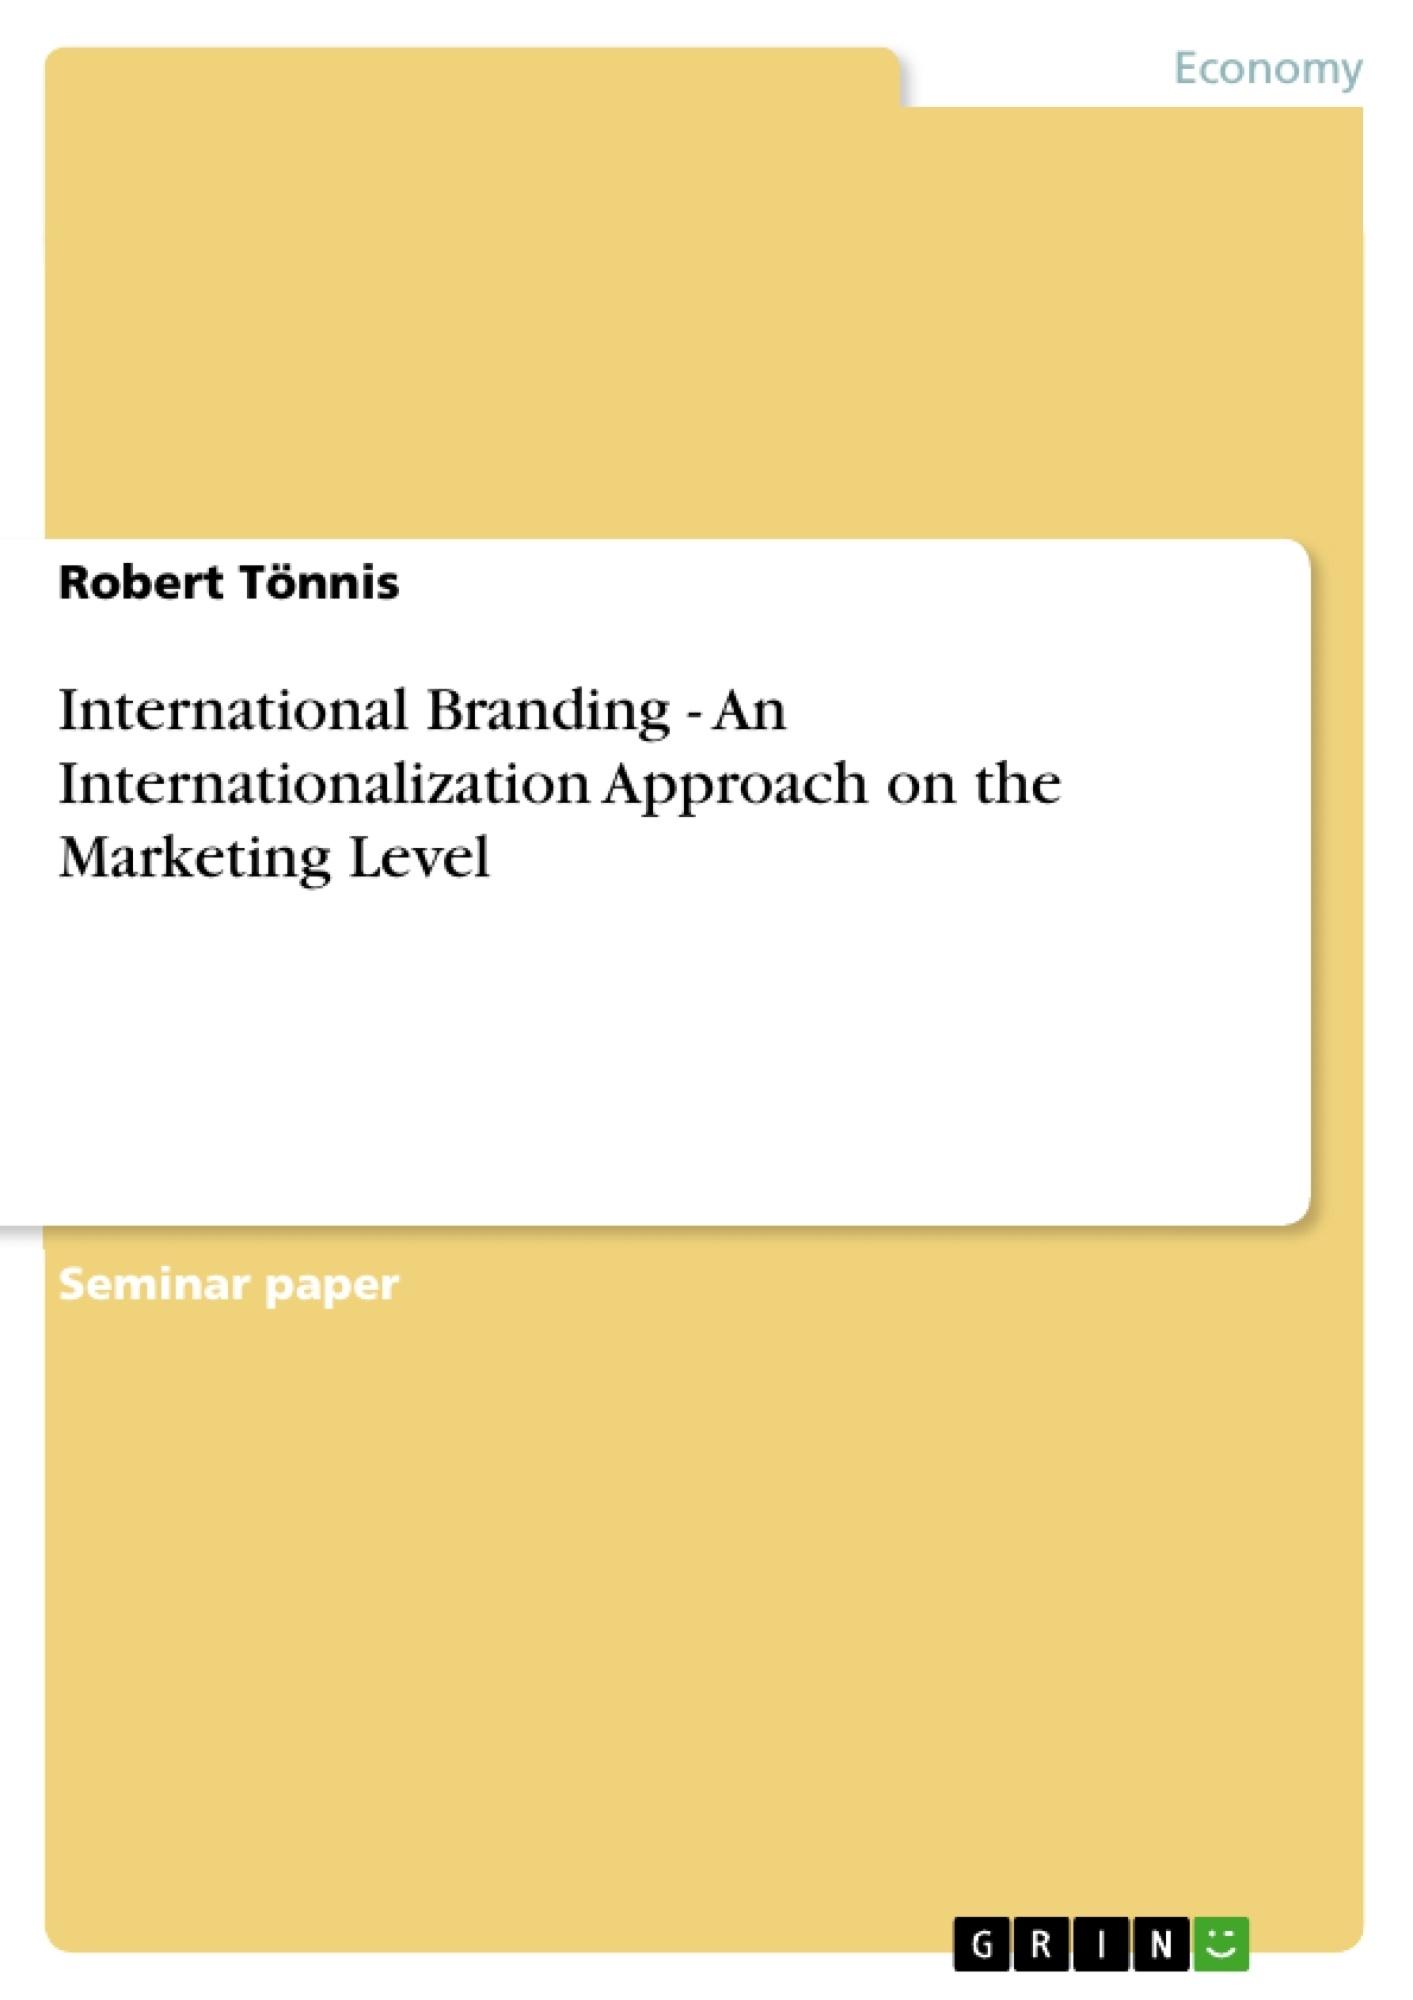 Title: International Branding - An Internationalization Approach on the Marketing Level